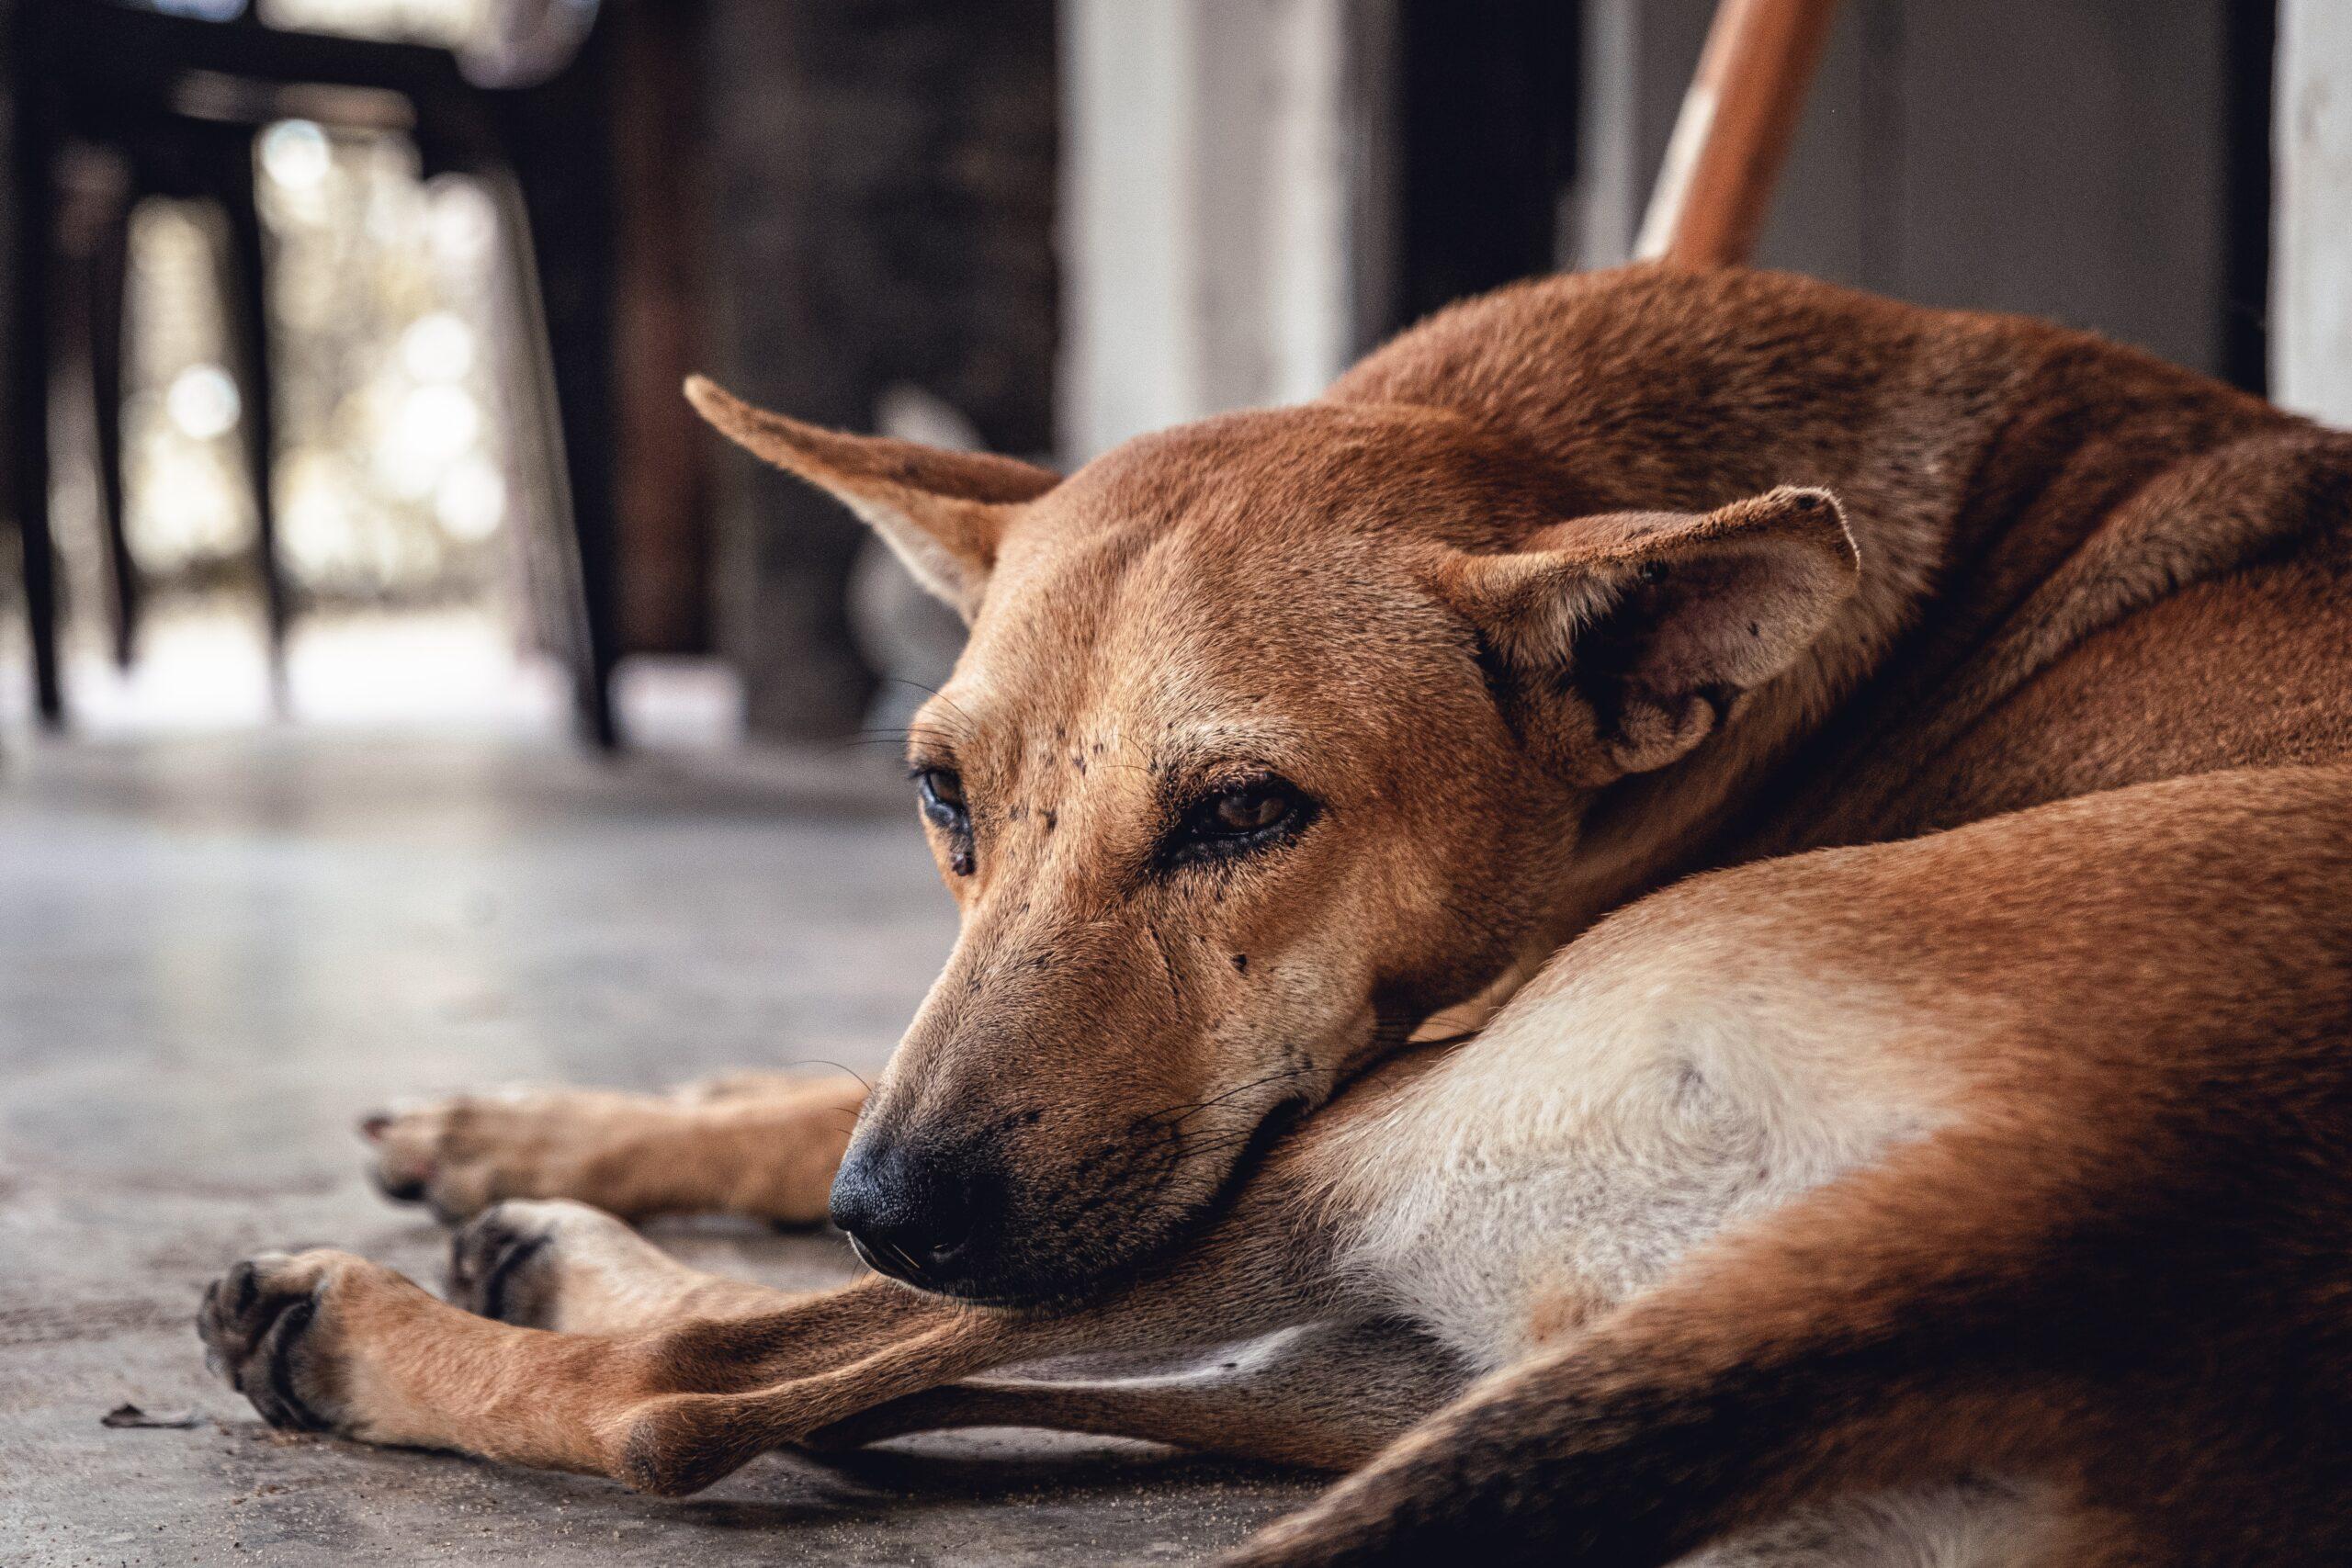 daniele-franchi-beautiful dog in repose-unsplash